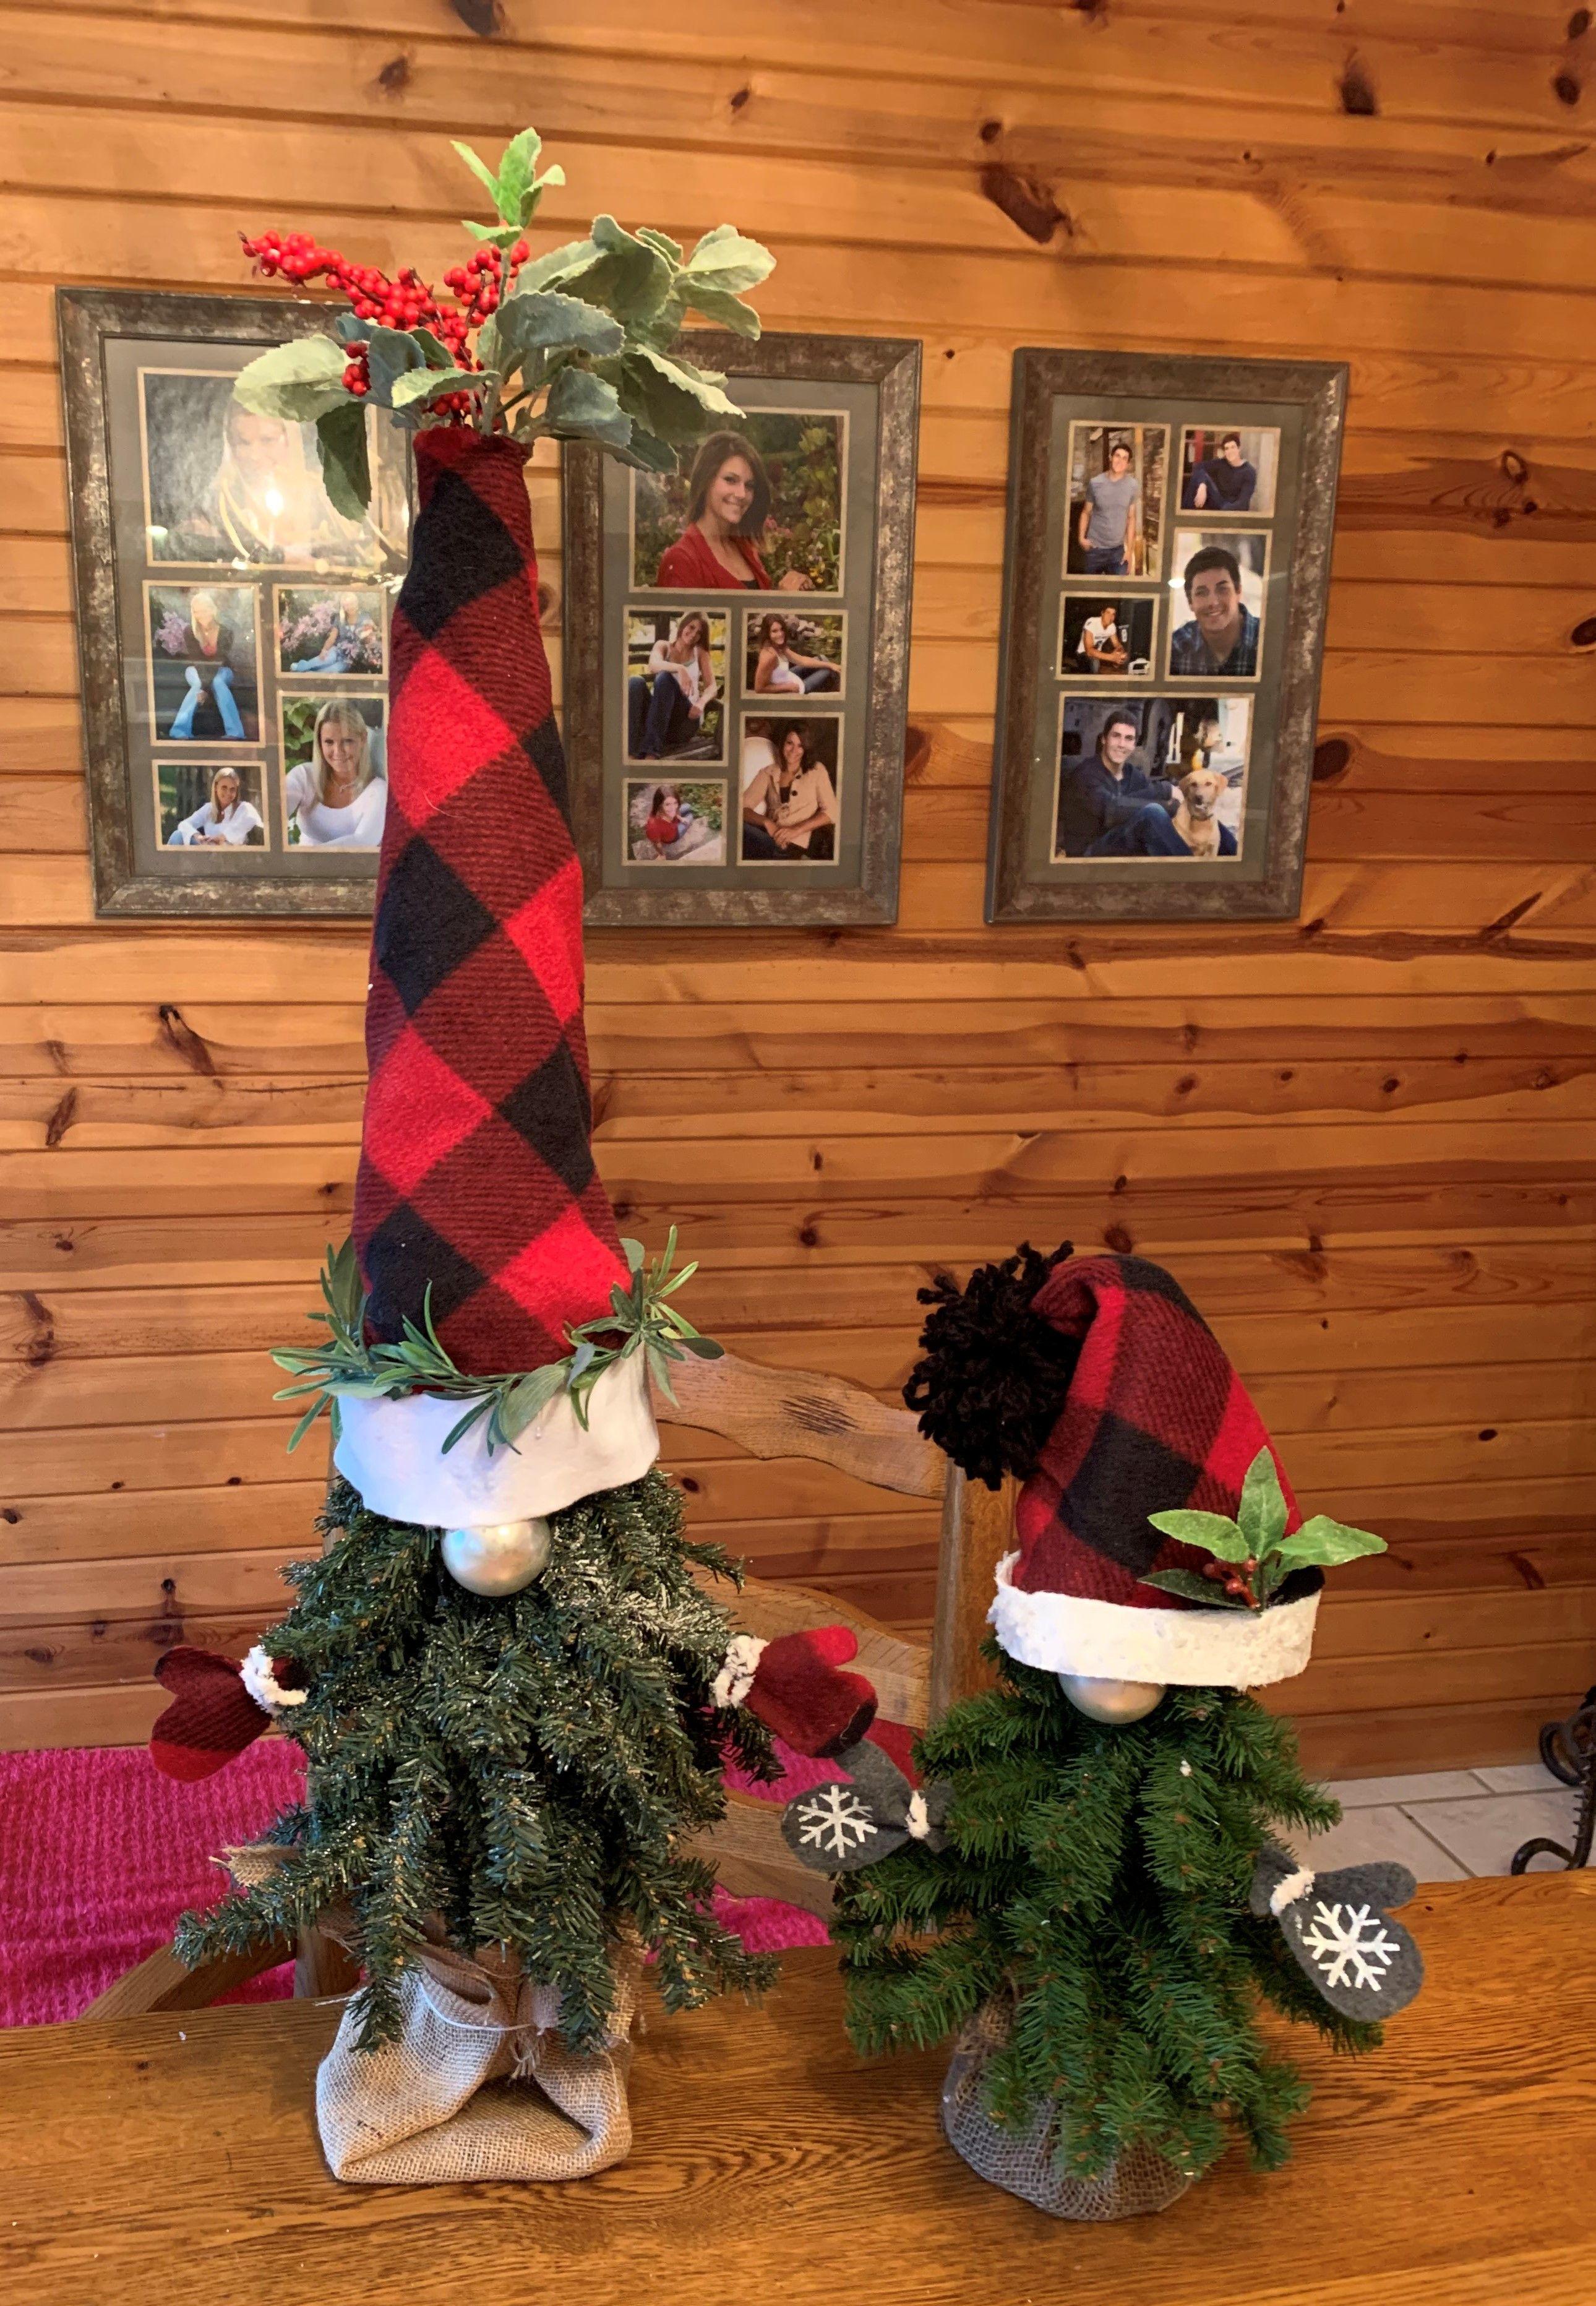 Addobbi Natalizi Goodwill.Goodwill Gnomes Diy Holiday Gifts Christmas Wreaths Diy Holiday